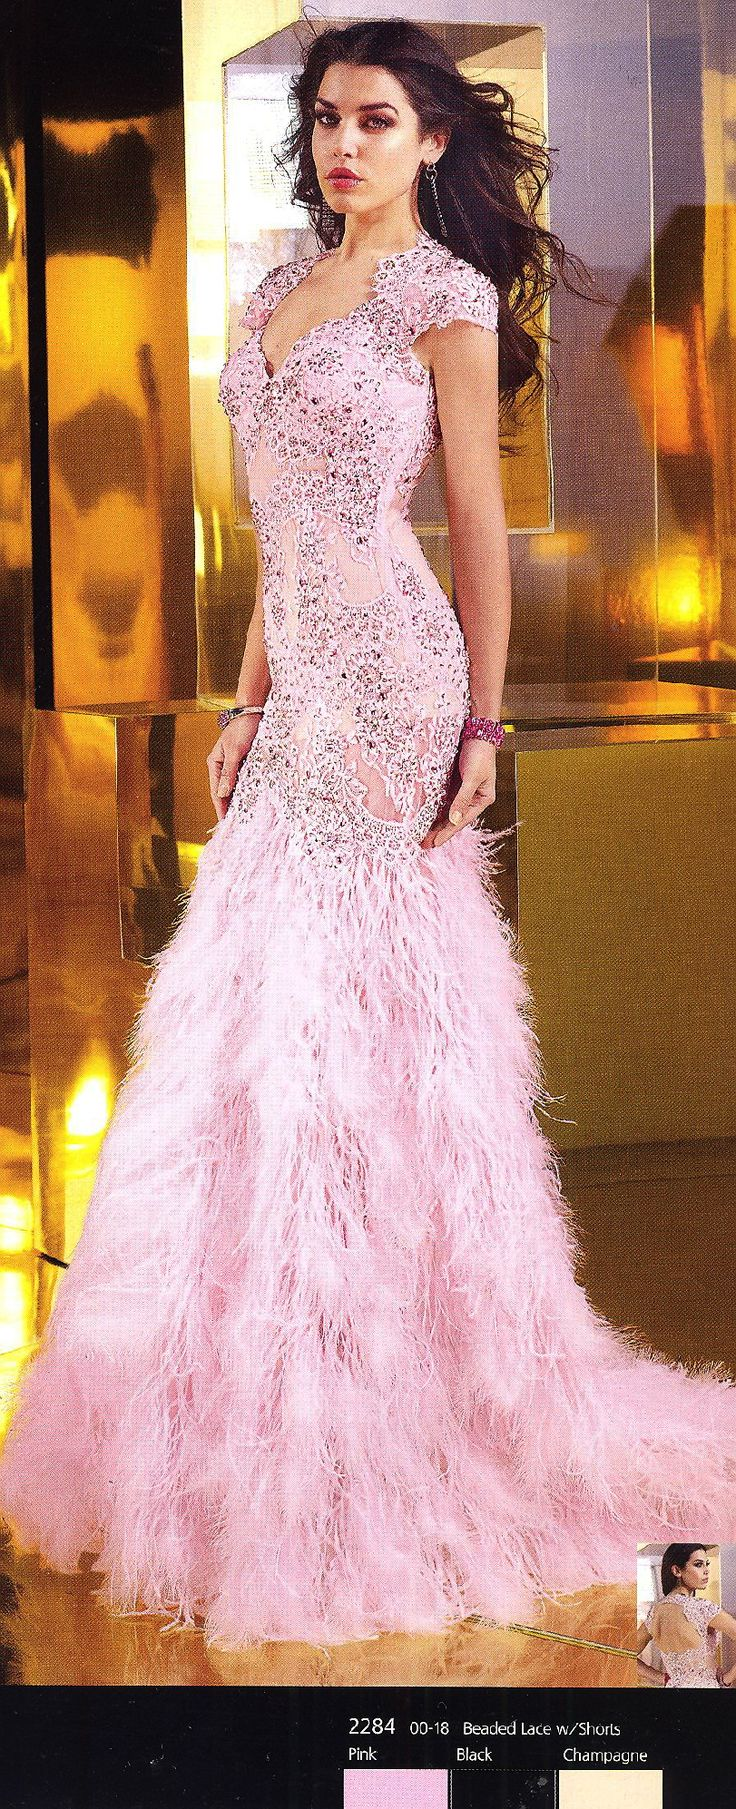 245 best pageant dresses images on Pinterest | Pageant dresses ...